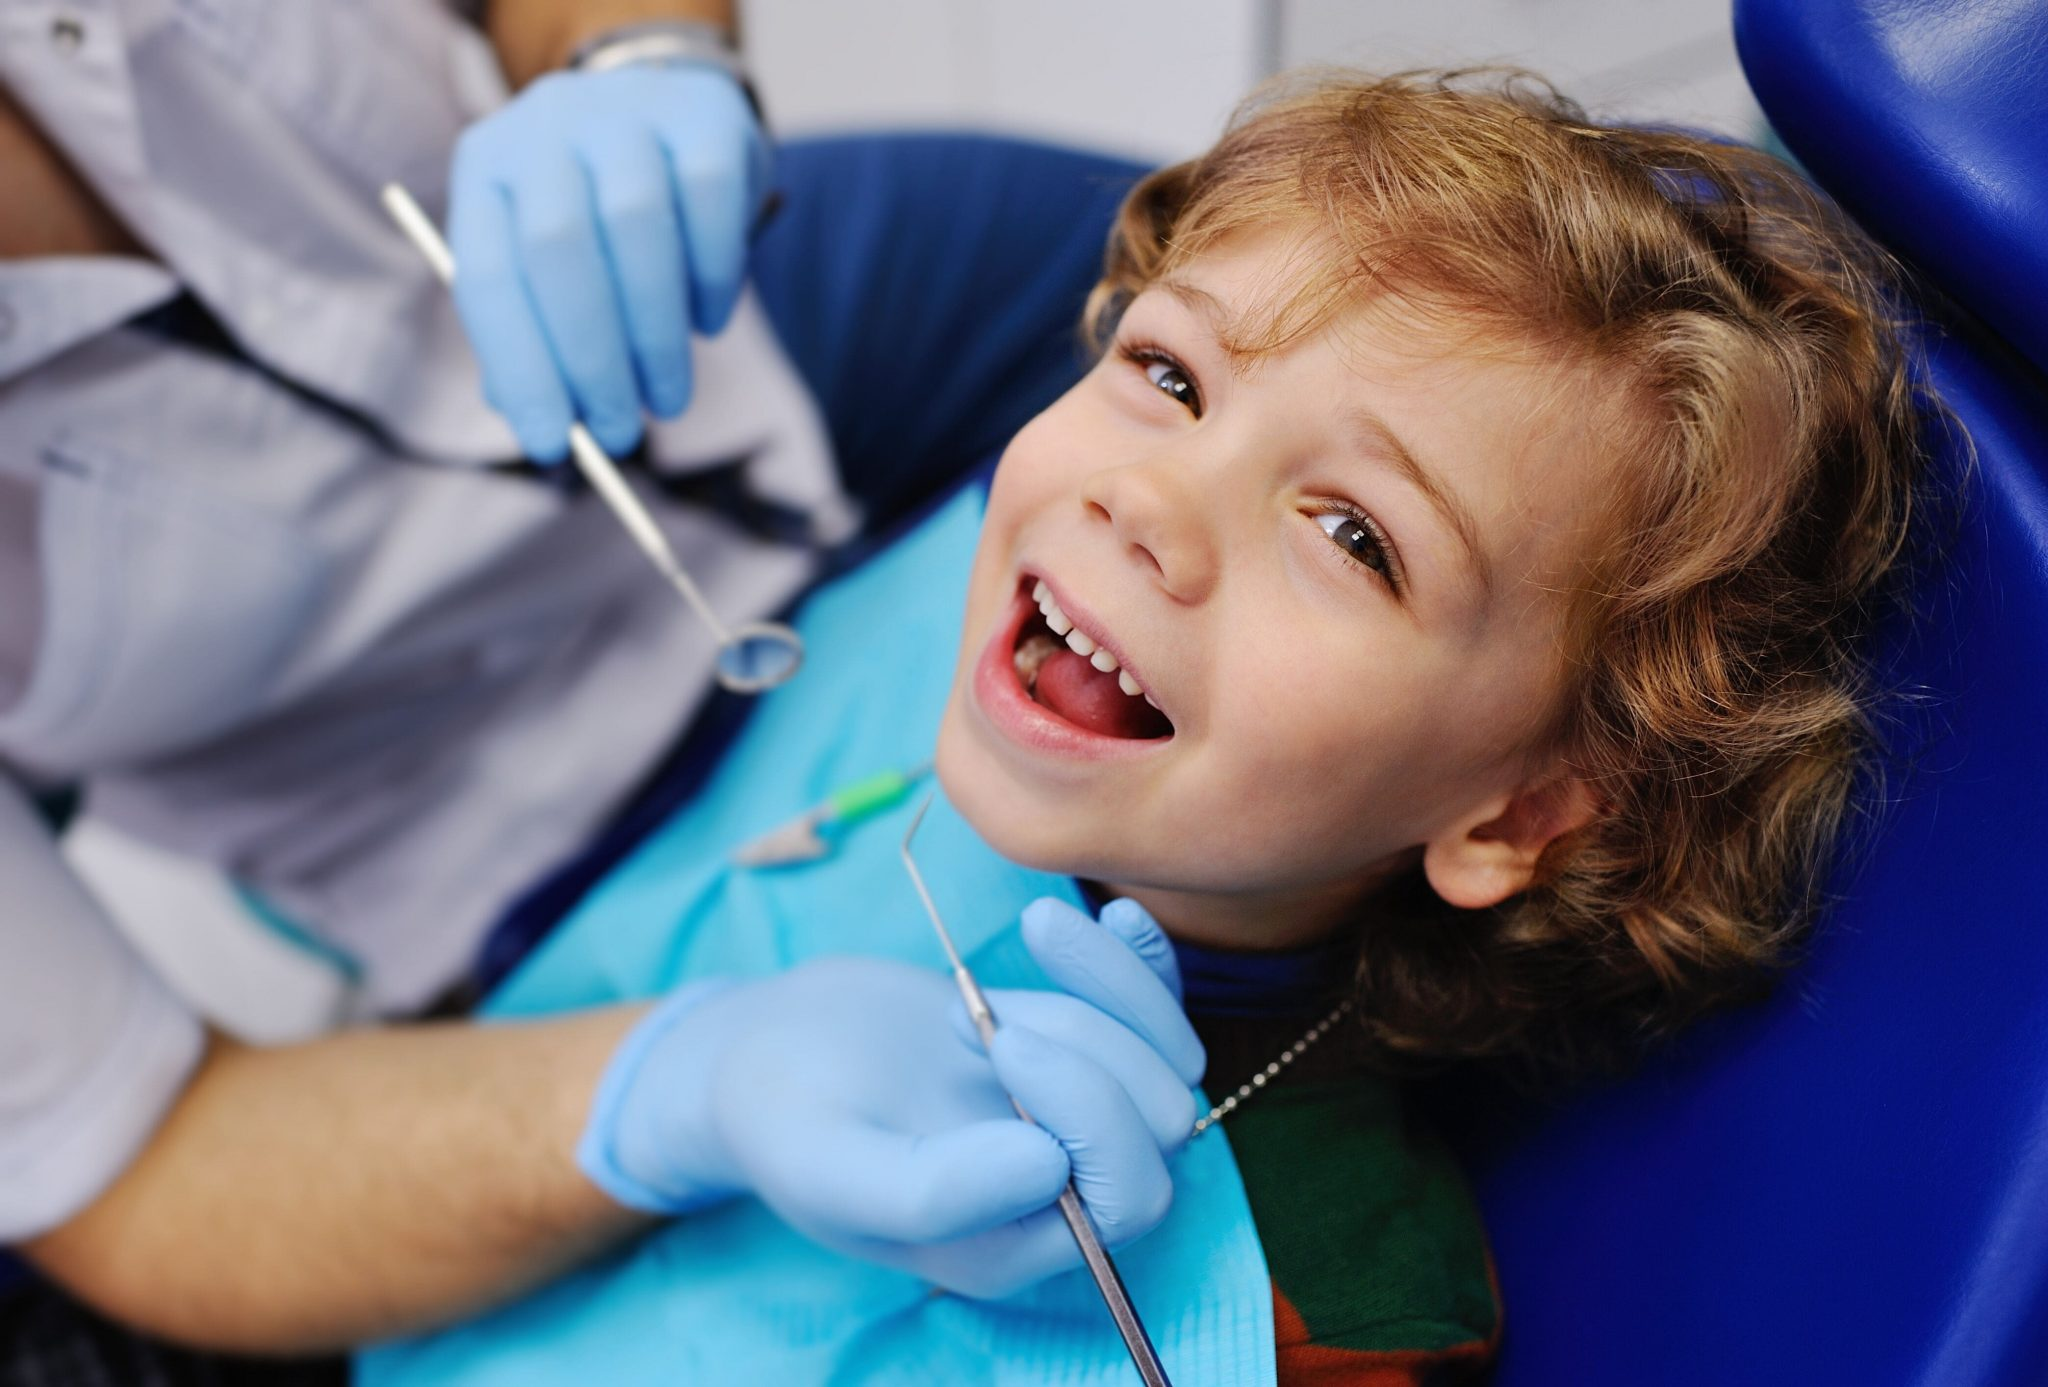 Pediatric Dentistry Of Syosset Little Boy Getting Dental Work Done